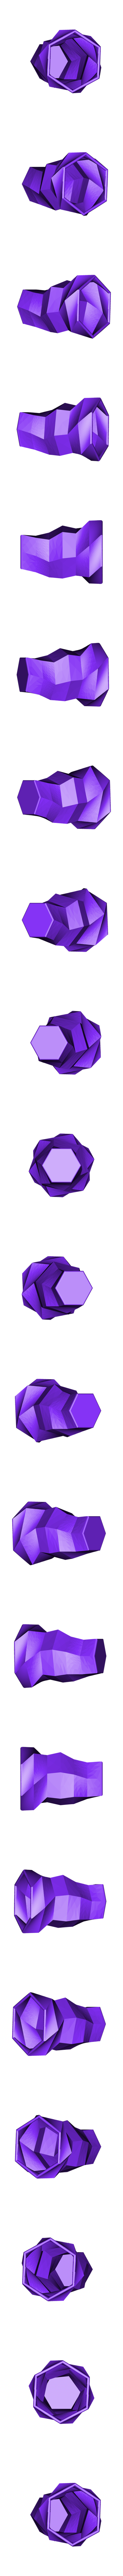 Vase120.stl Download free STL file Vase • Object to 3D print, squiqui